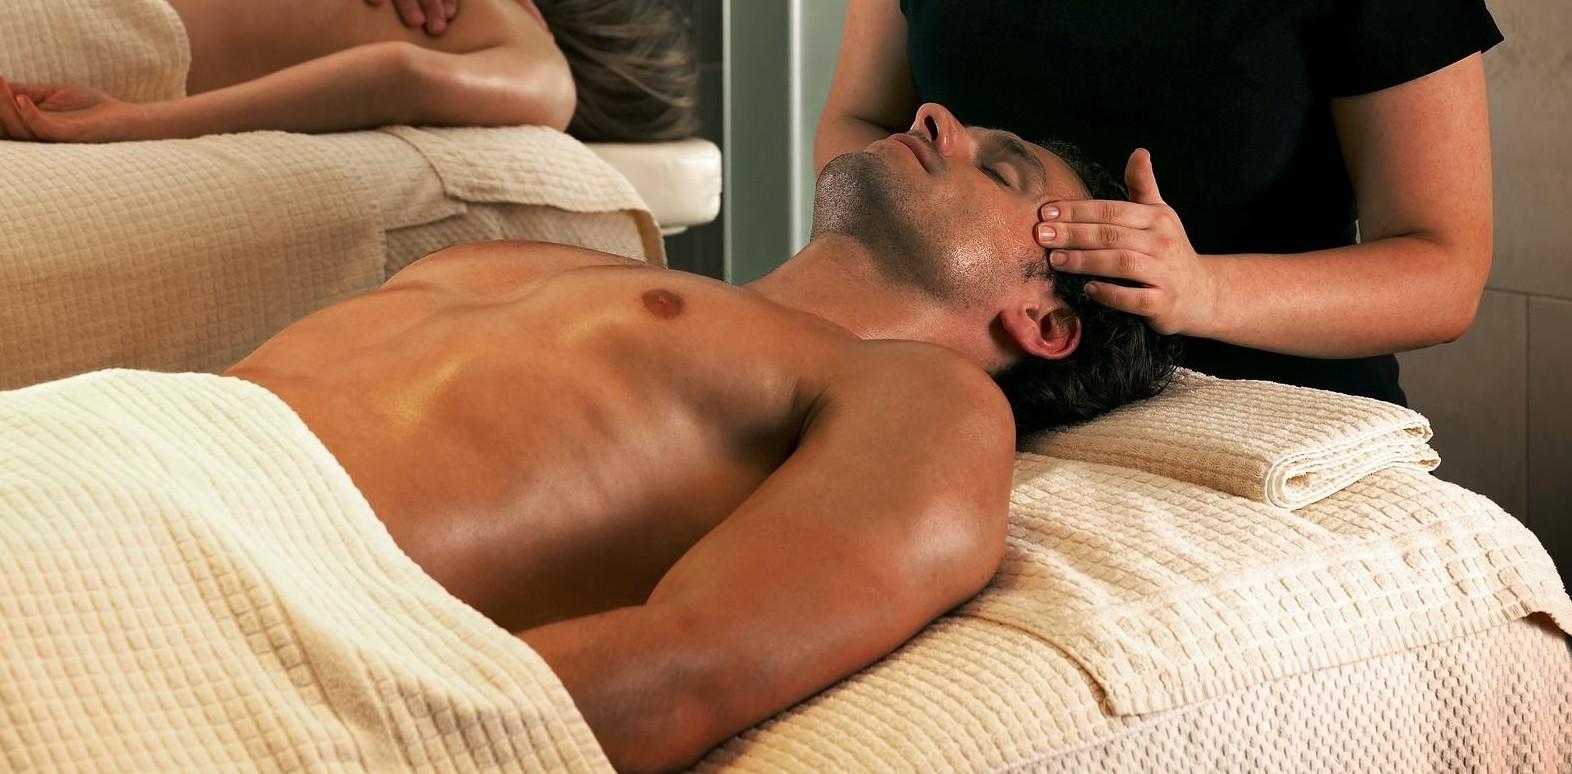 gay superdotati video massaggi gay catania